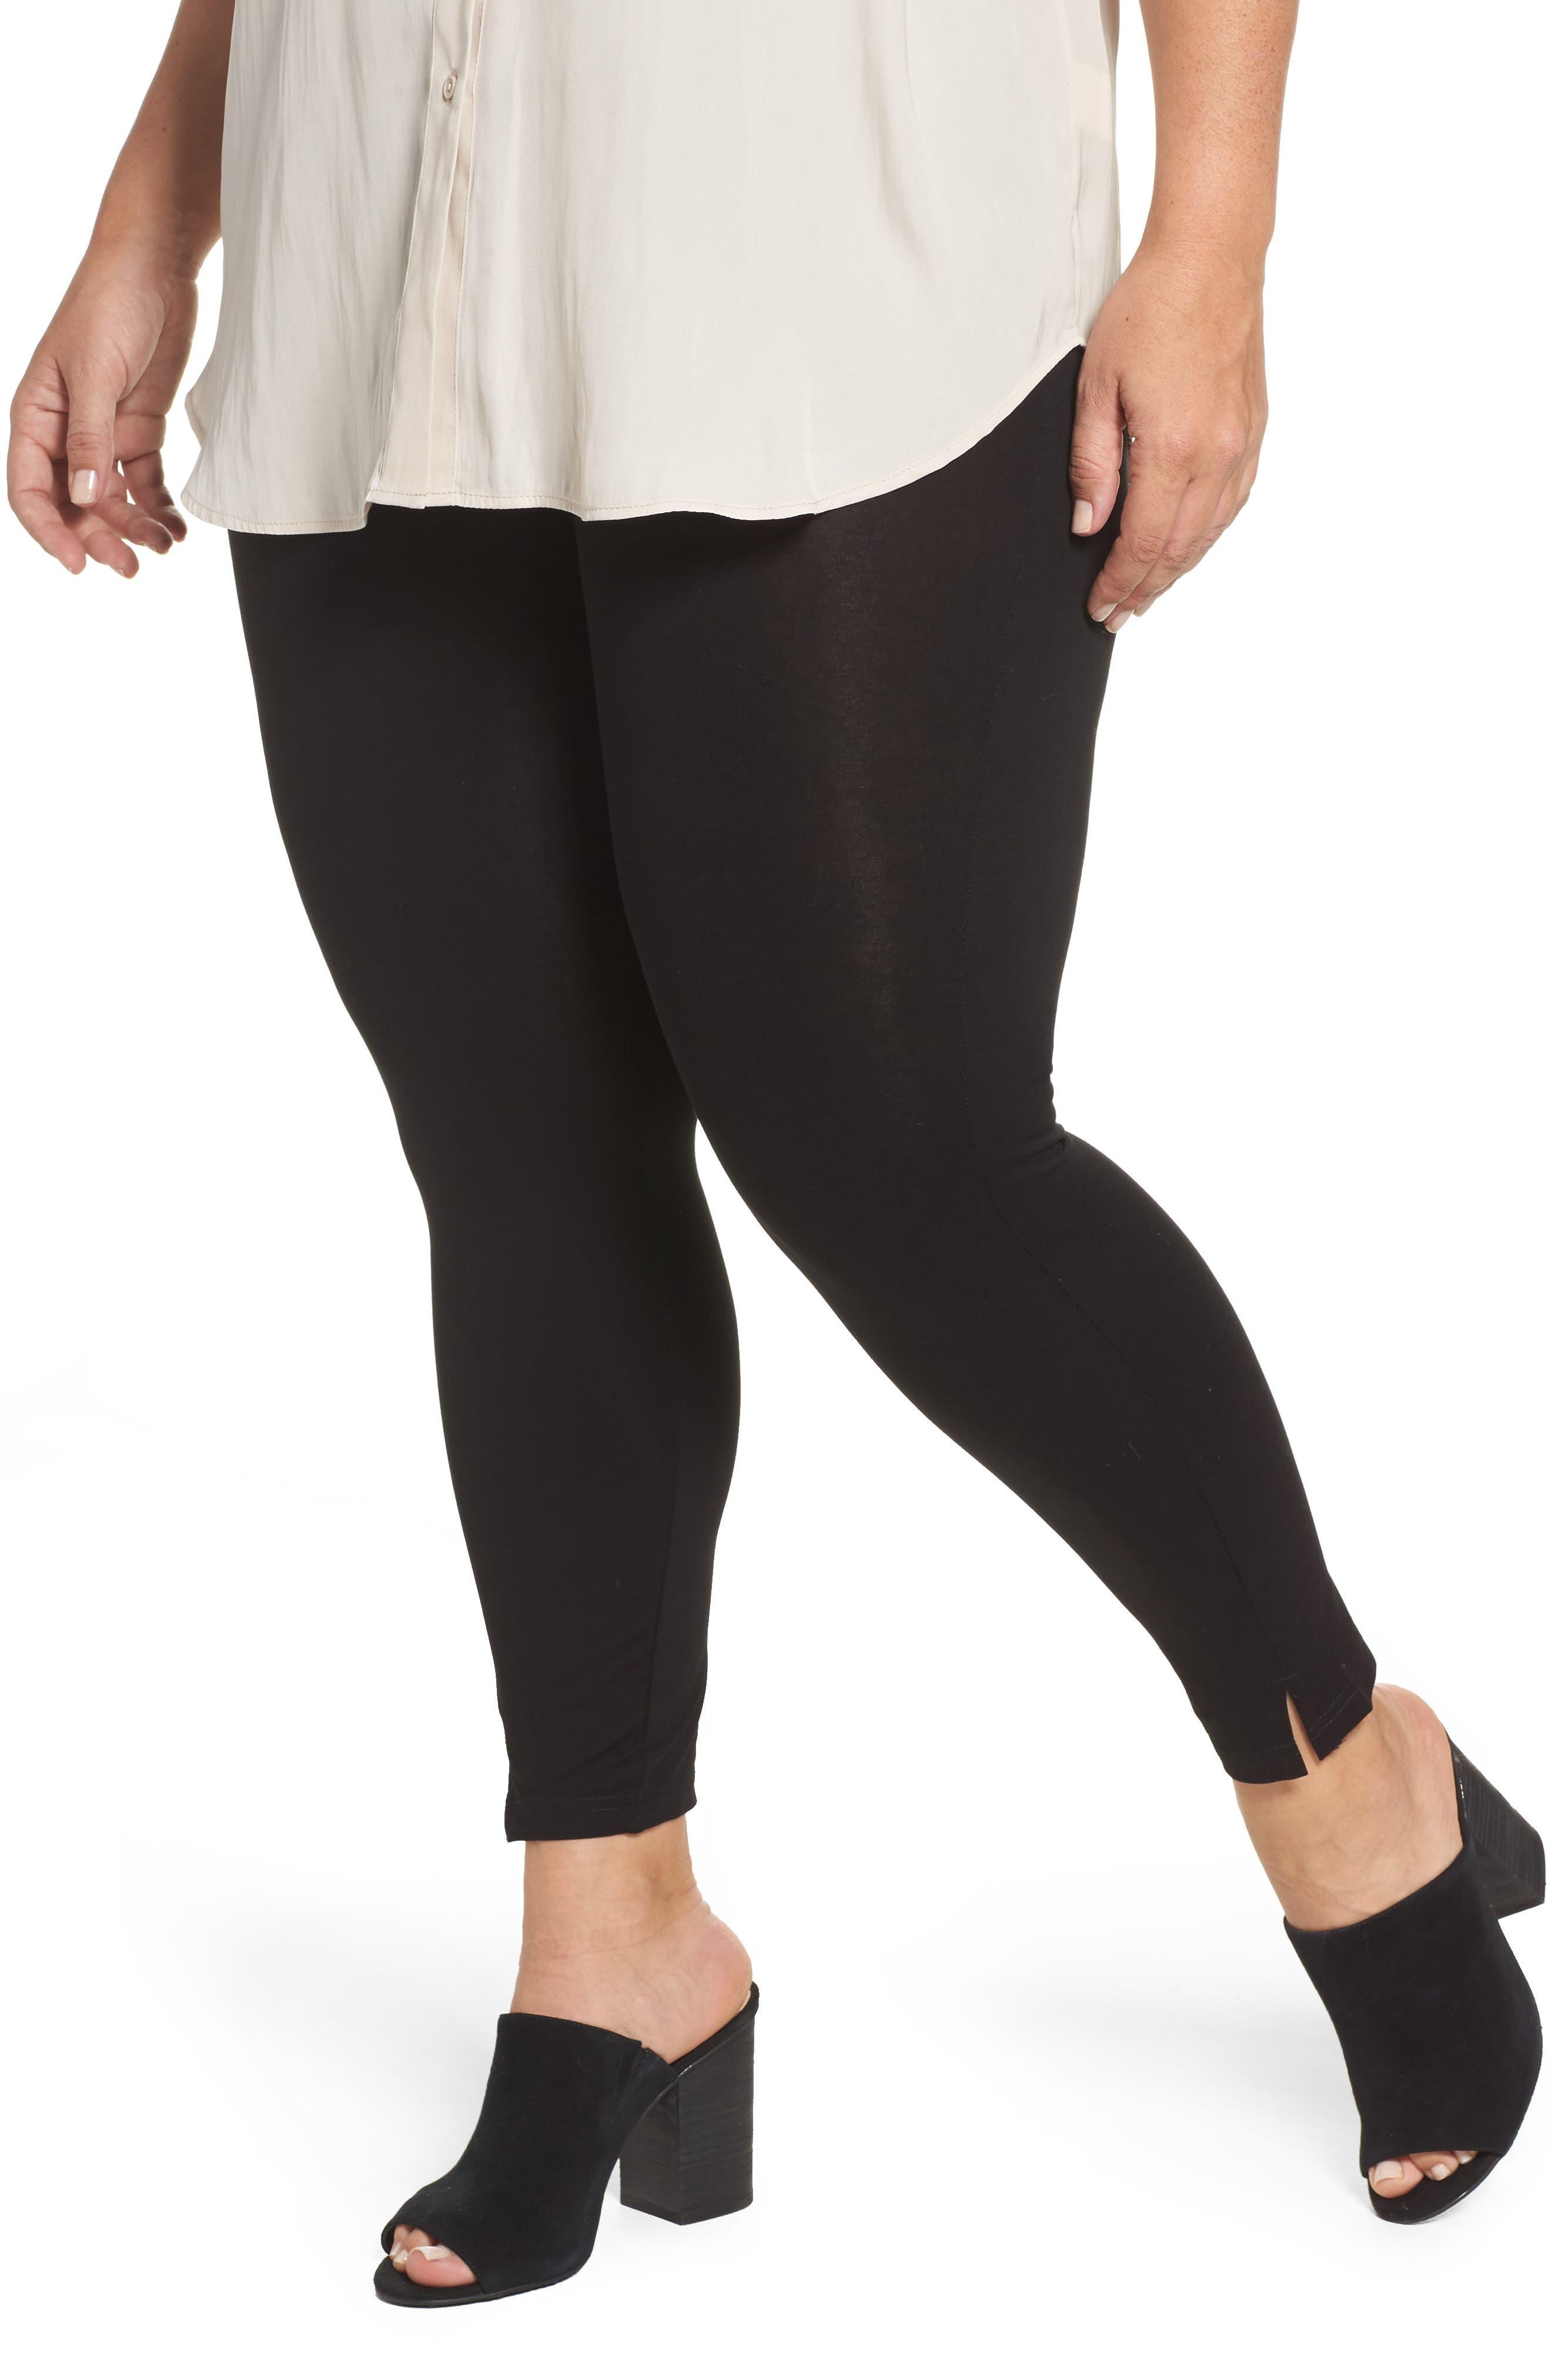 Hue Mercerized Cotton Leggings (Plus Size)